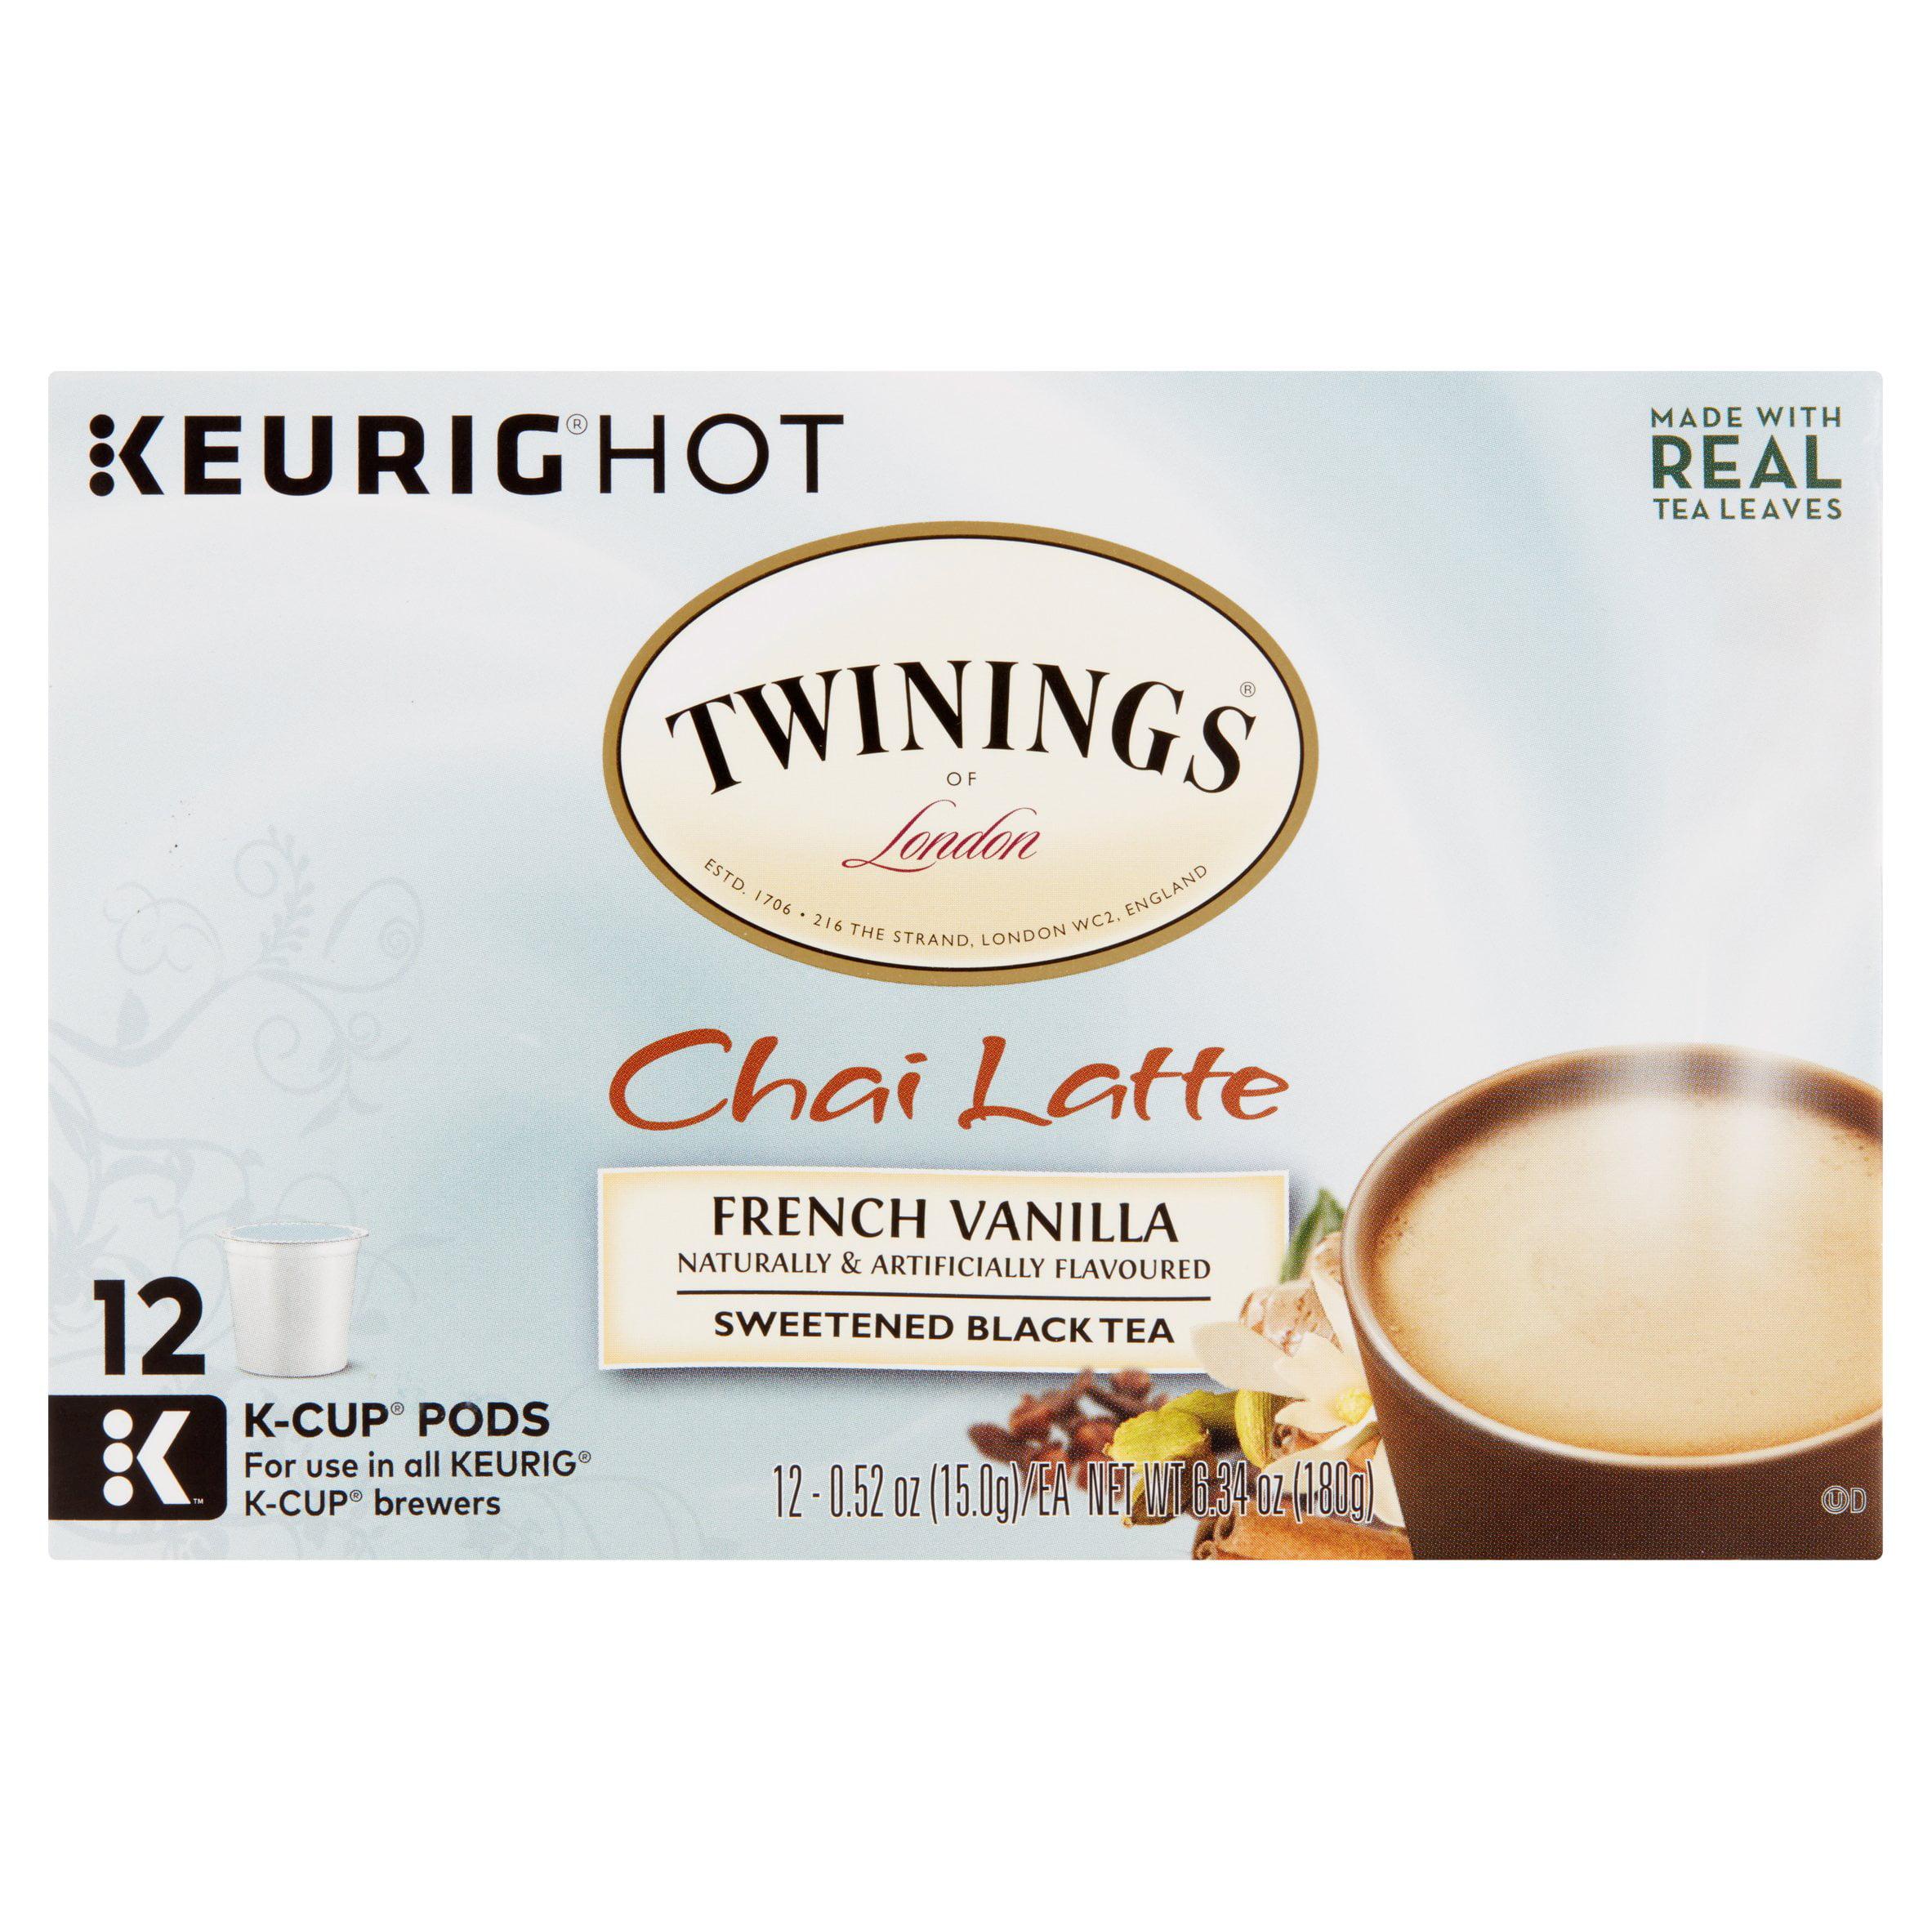 Keurig Hot Twinings of London Chai Latte French Vanilla Sweetened Black Tea, 0.52 oz, 12 pc, 6 pack